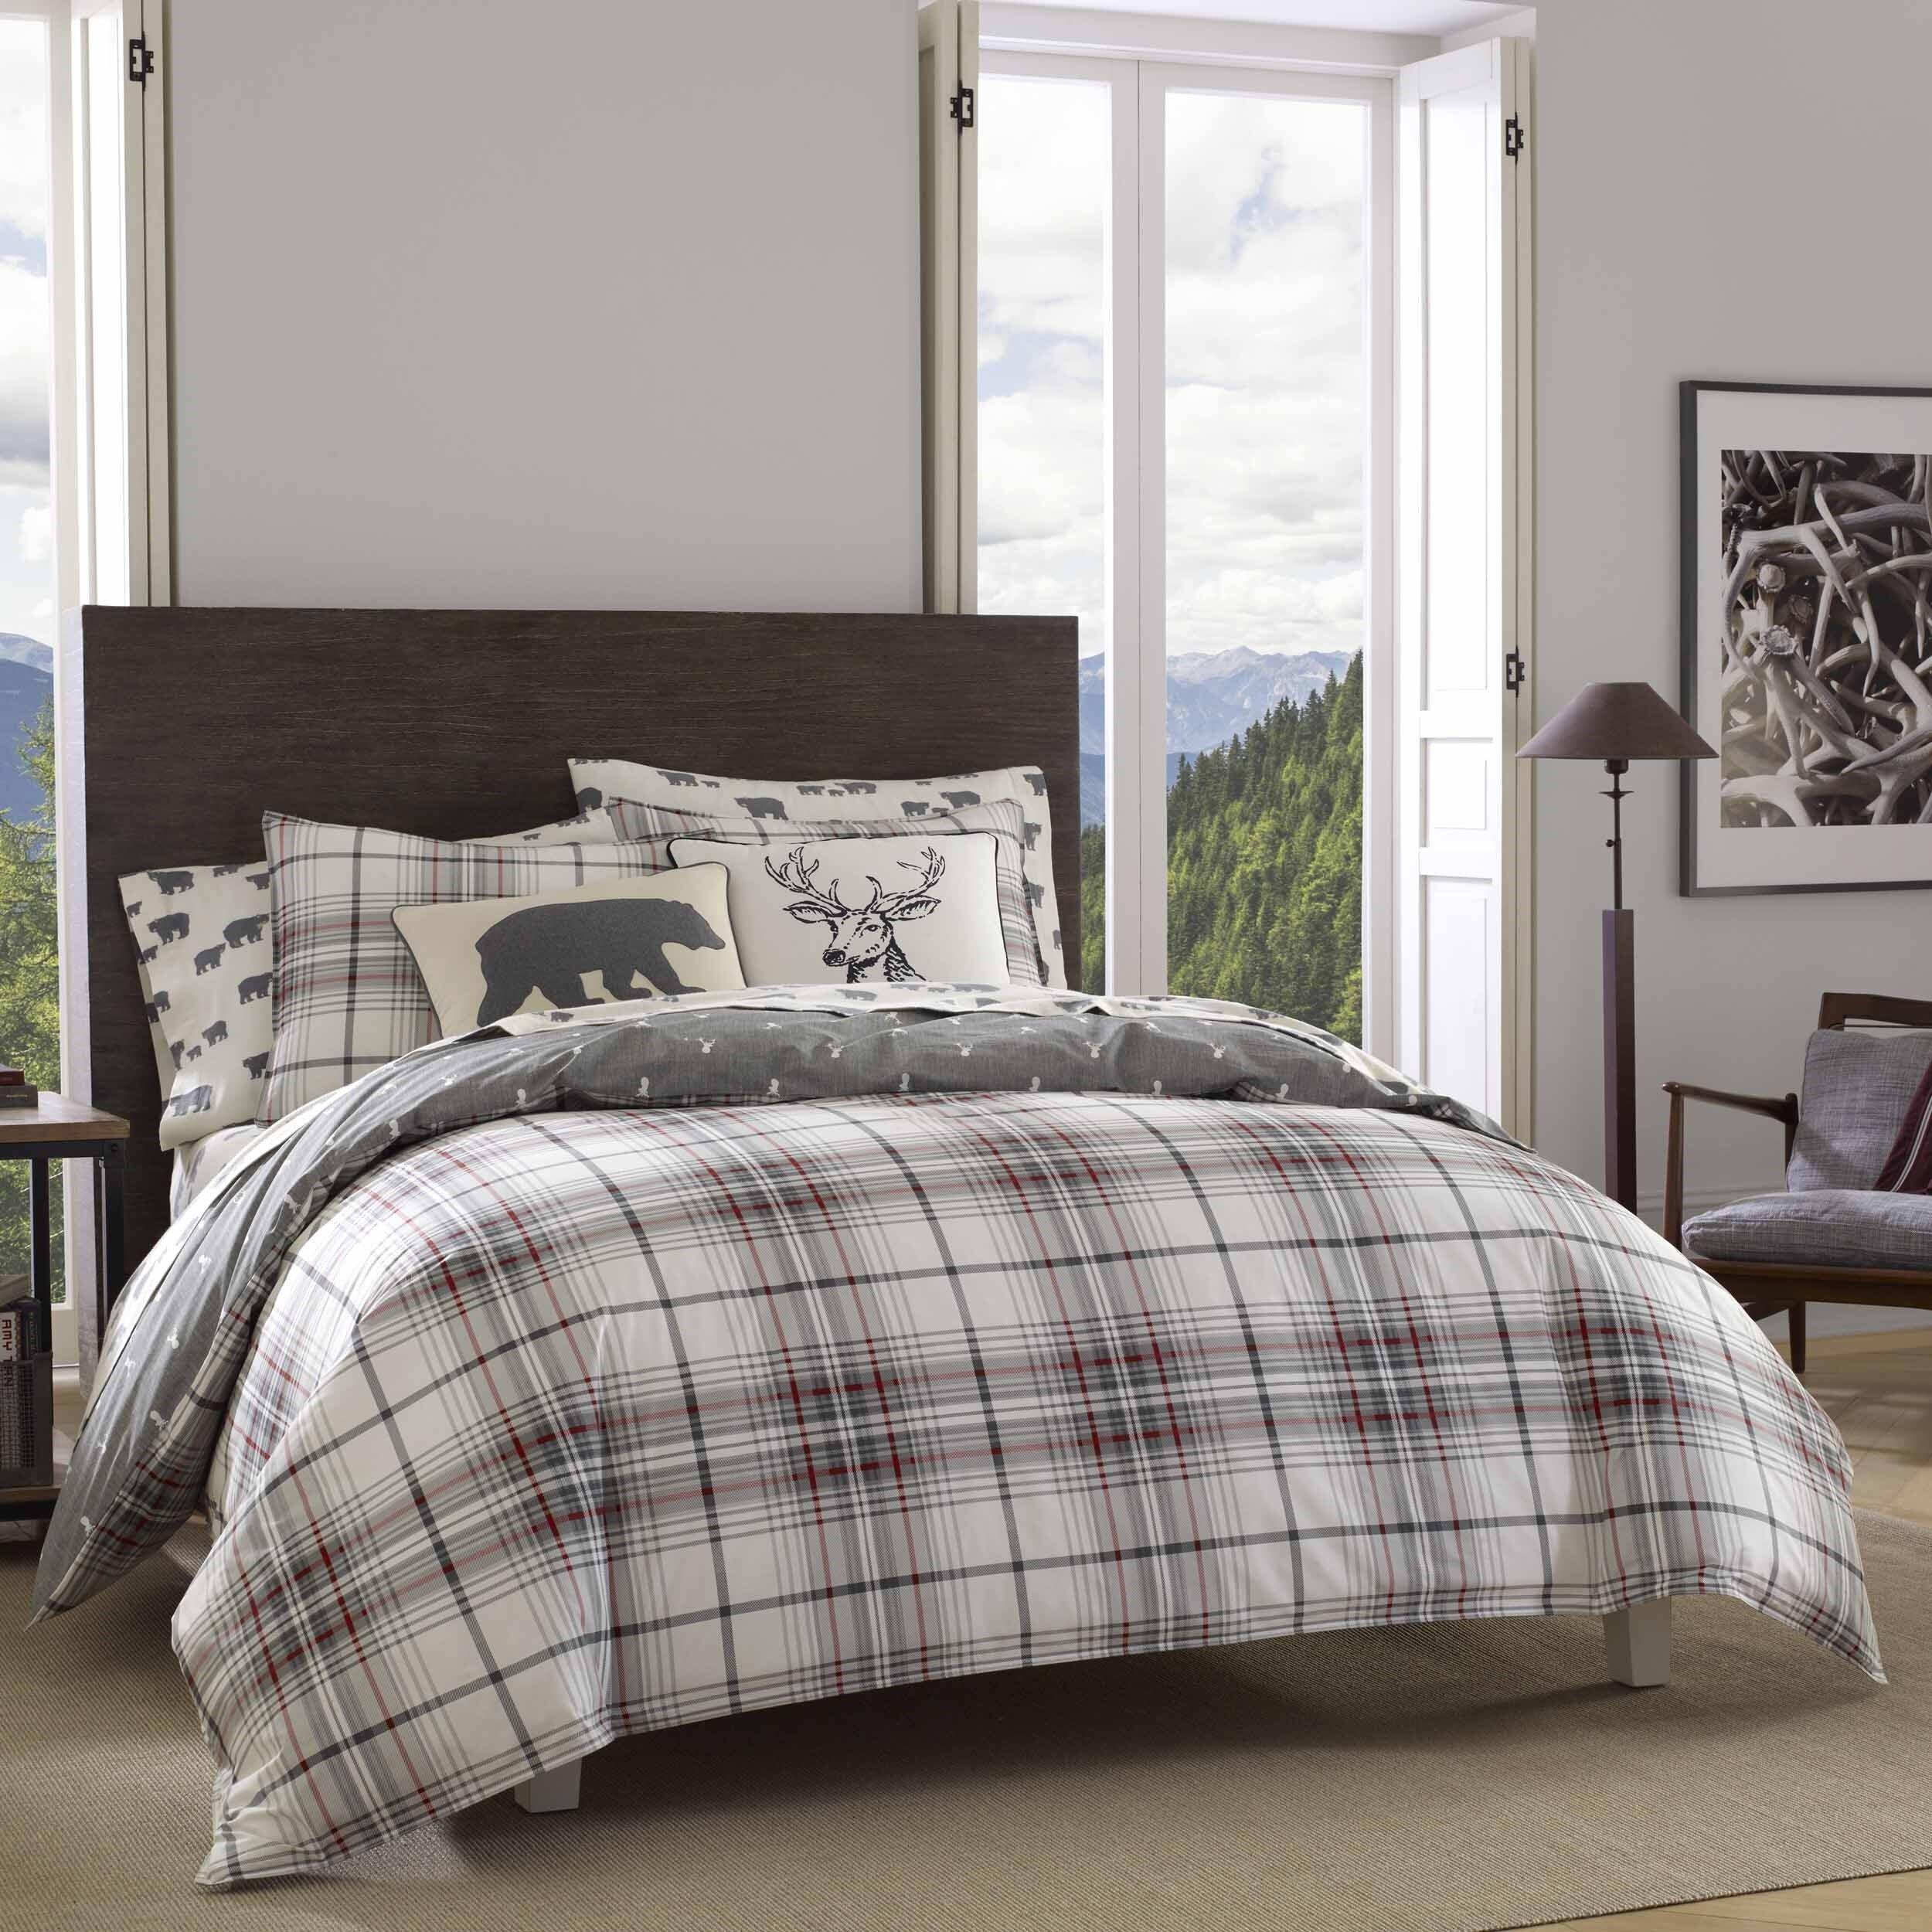 Eddie Bauer Alder Plaid Reversible Comforter Set Reviews Wayfair